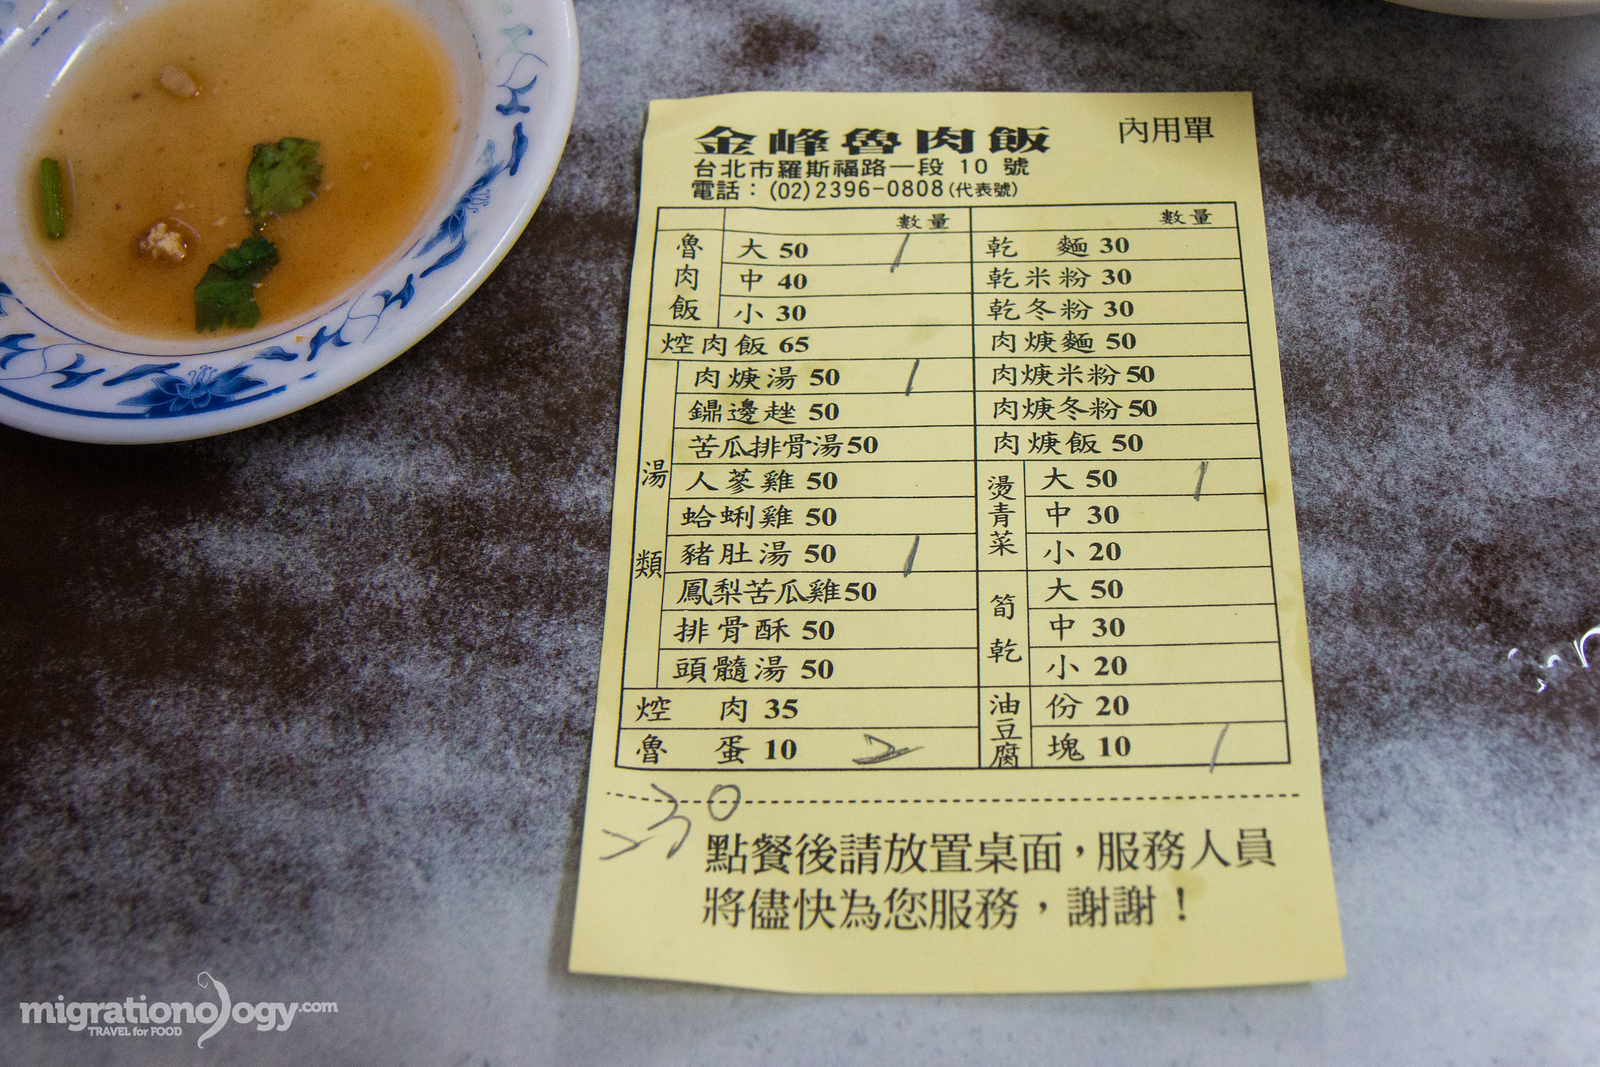 Jin Feng (金峰魯肉飯) restaurant